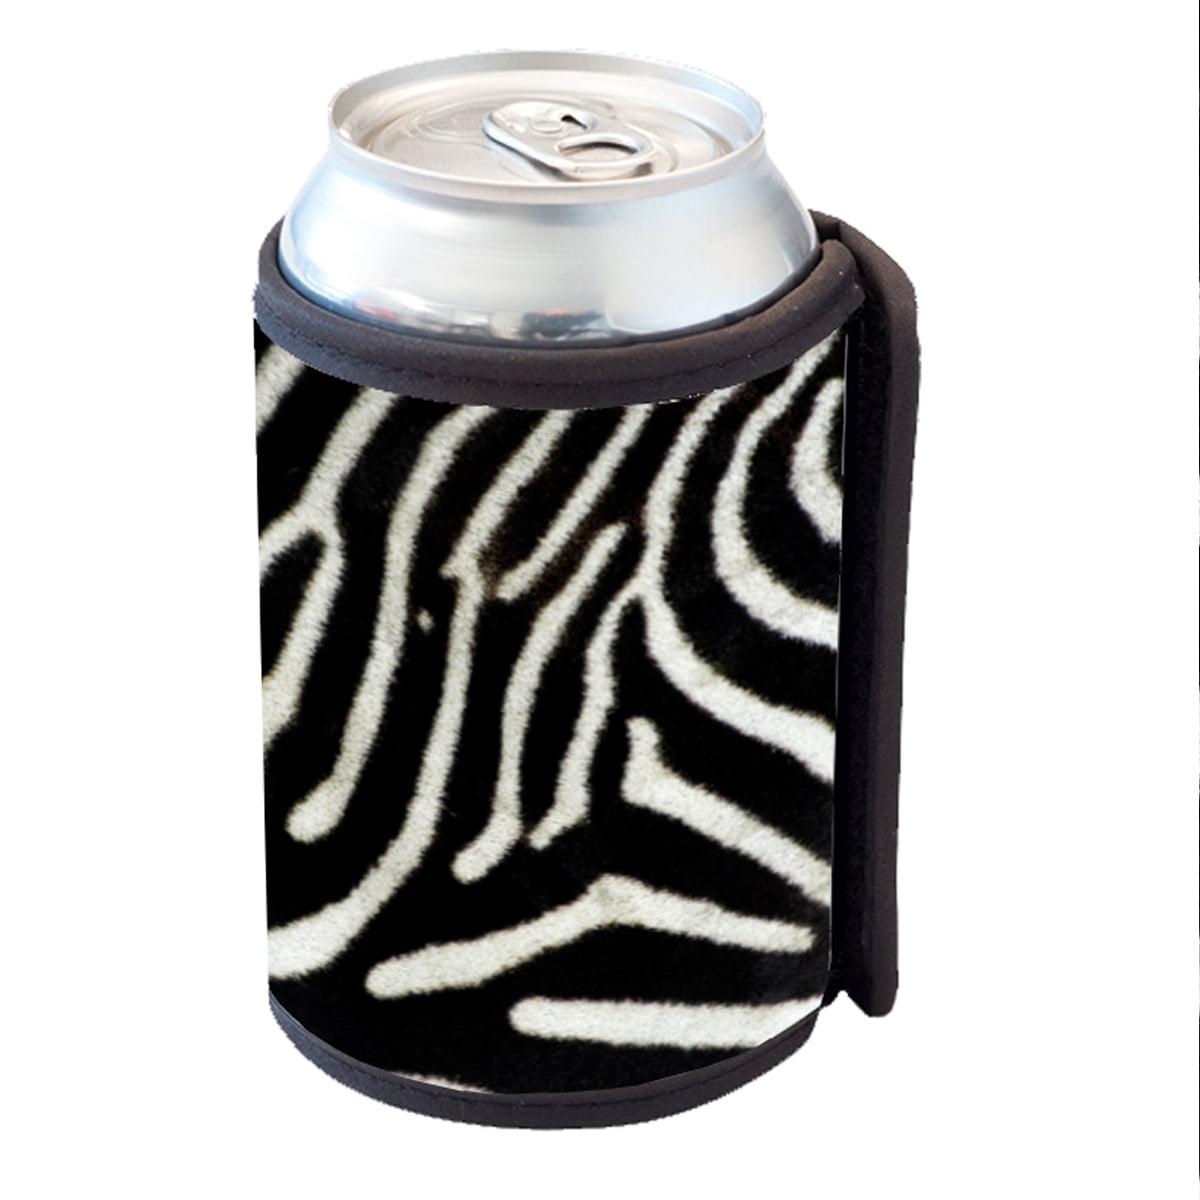 KuzmarK Insulated Drink Can Cooler Hugger - Zebra